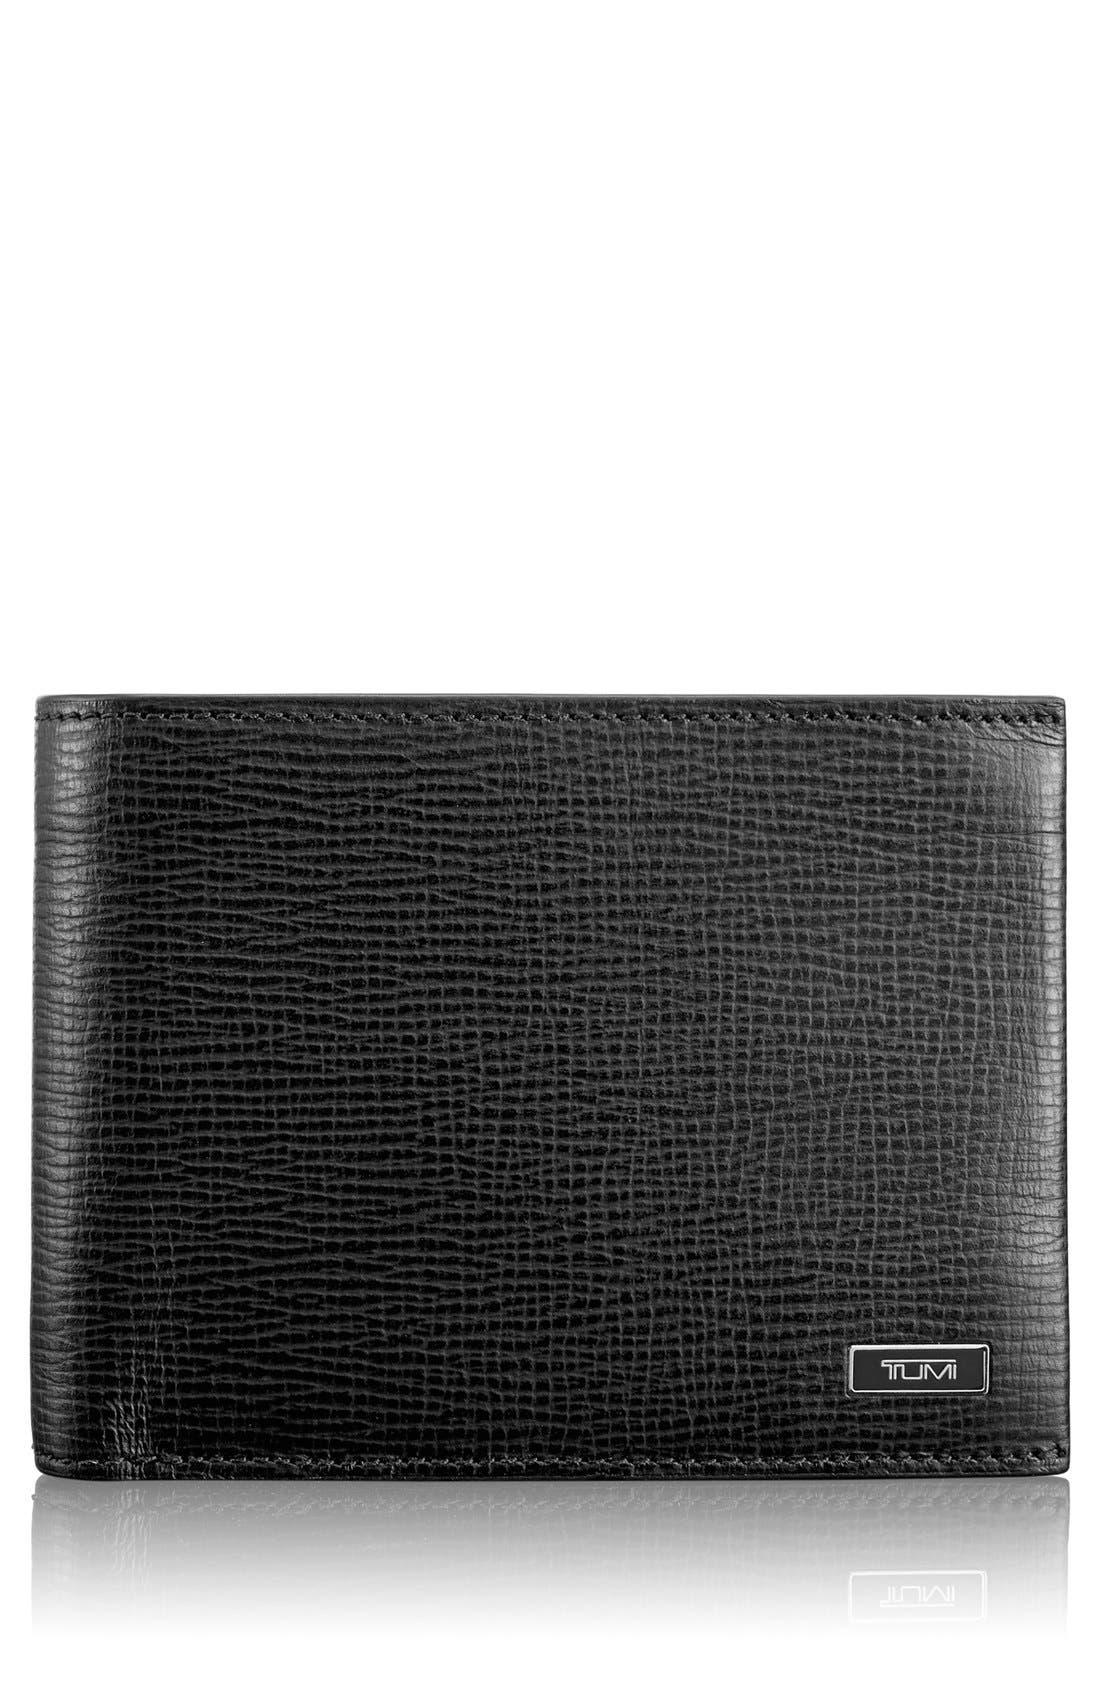 Monaco Global Double Billfold Leather Wallet,                         Main,                         color, 001